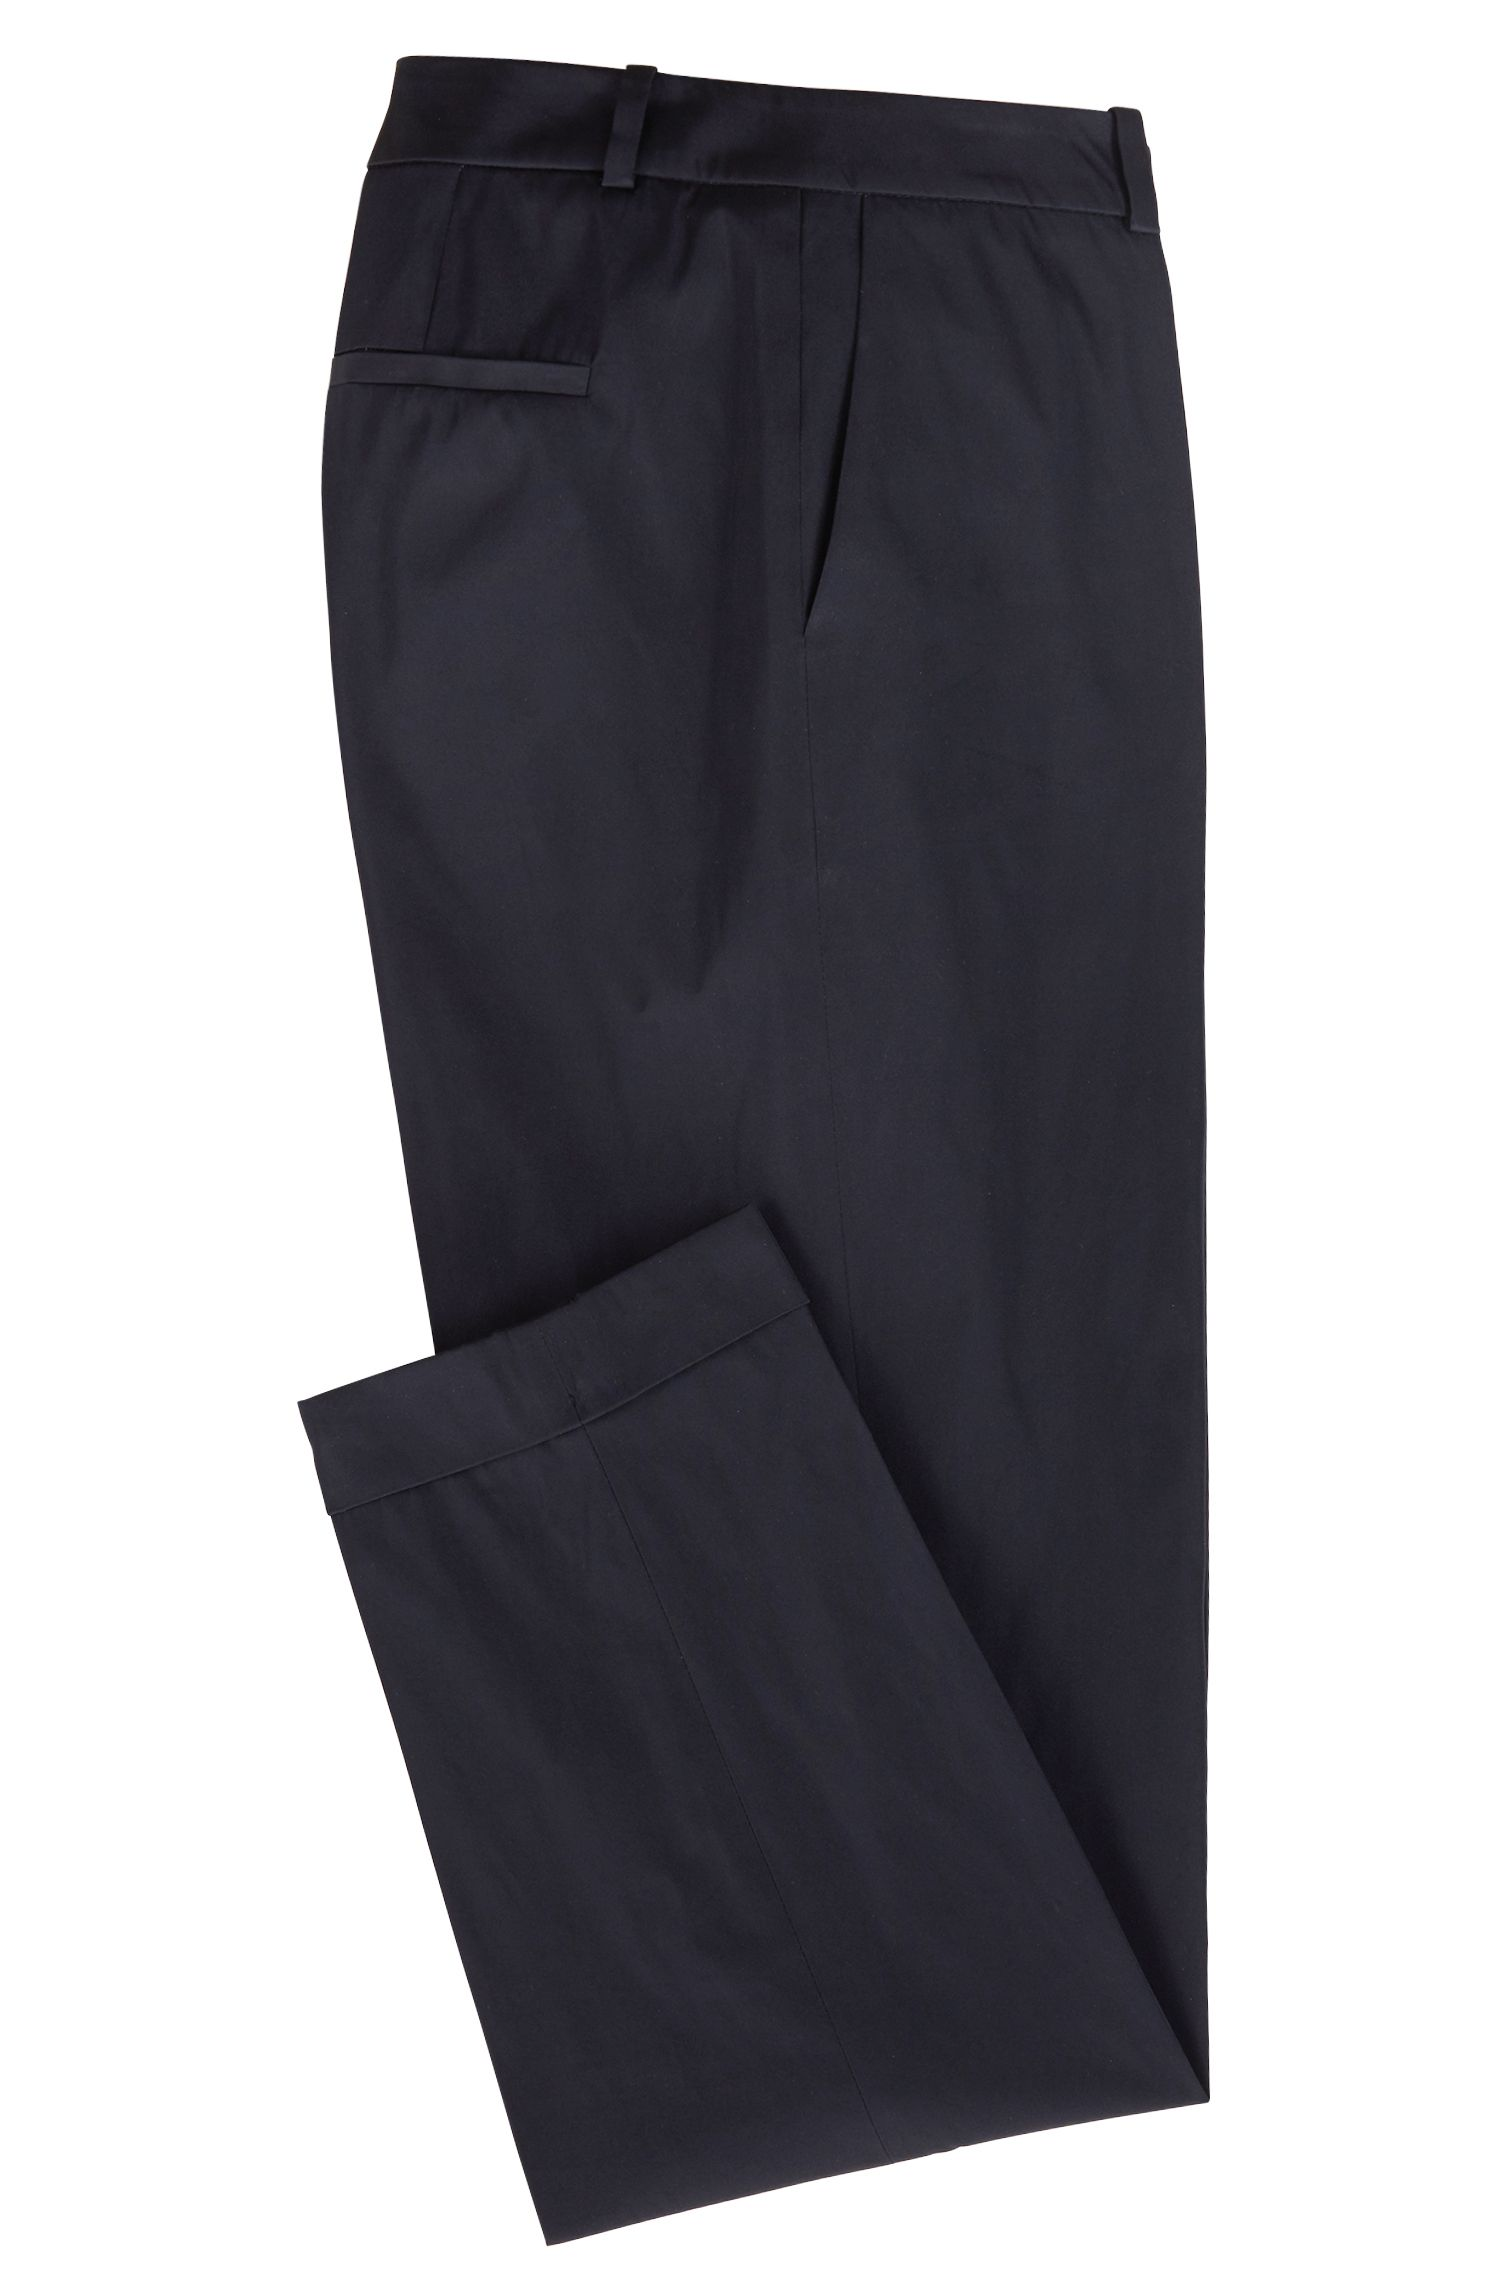 Relaxed-Fit Hose aus doppelt gewebtem italienischem Taft, Dunkelblau